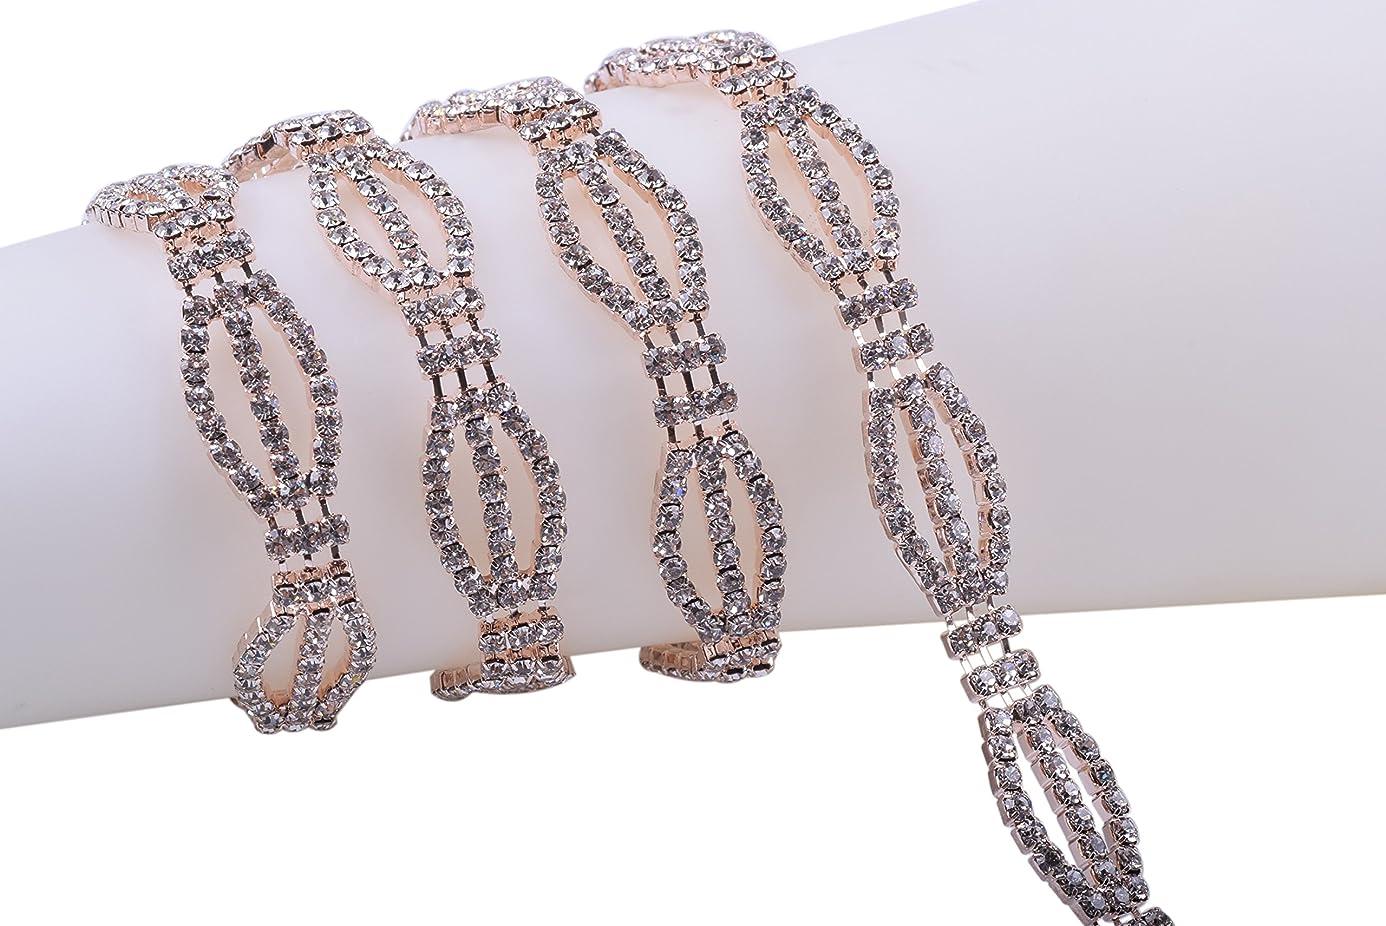 KAOYOO 1 Yard Rhinestone Chain Trim with Clear Crystal Rhinestone Rose Golden Chain for DIY Hair Tiara Wedding Embellishments cah7369431